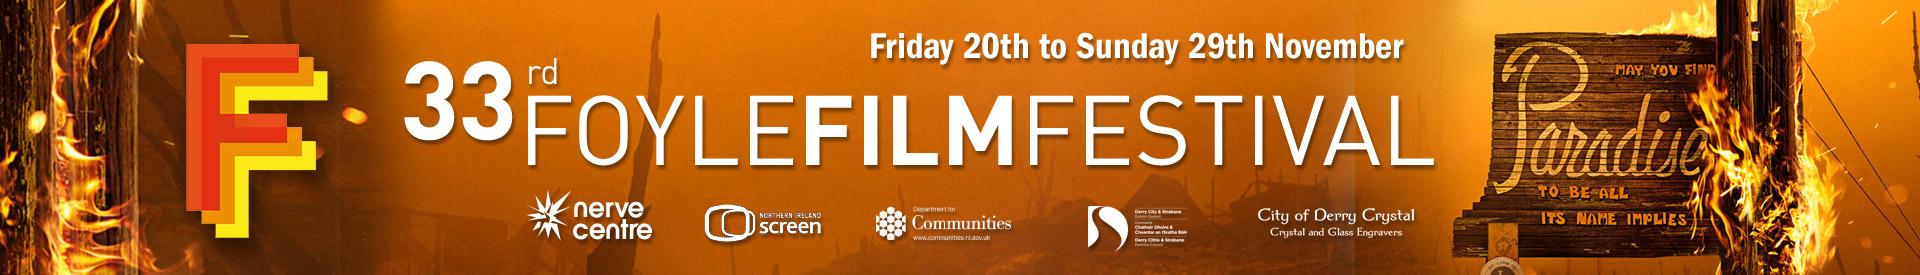 Foyle Film Festival 2020